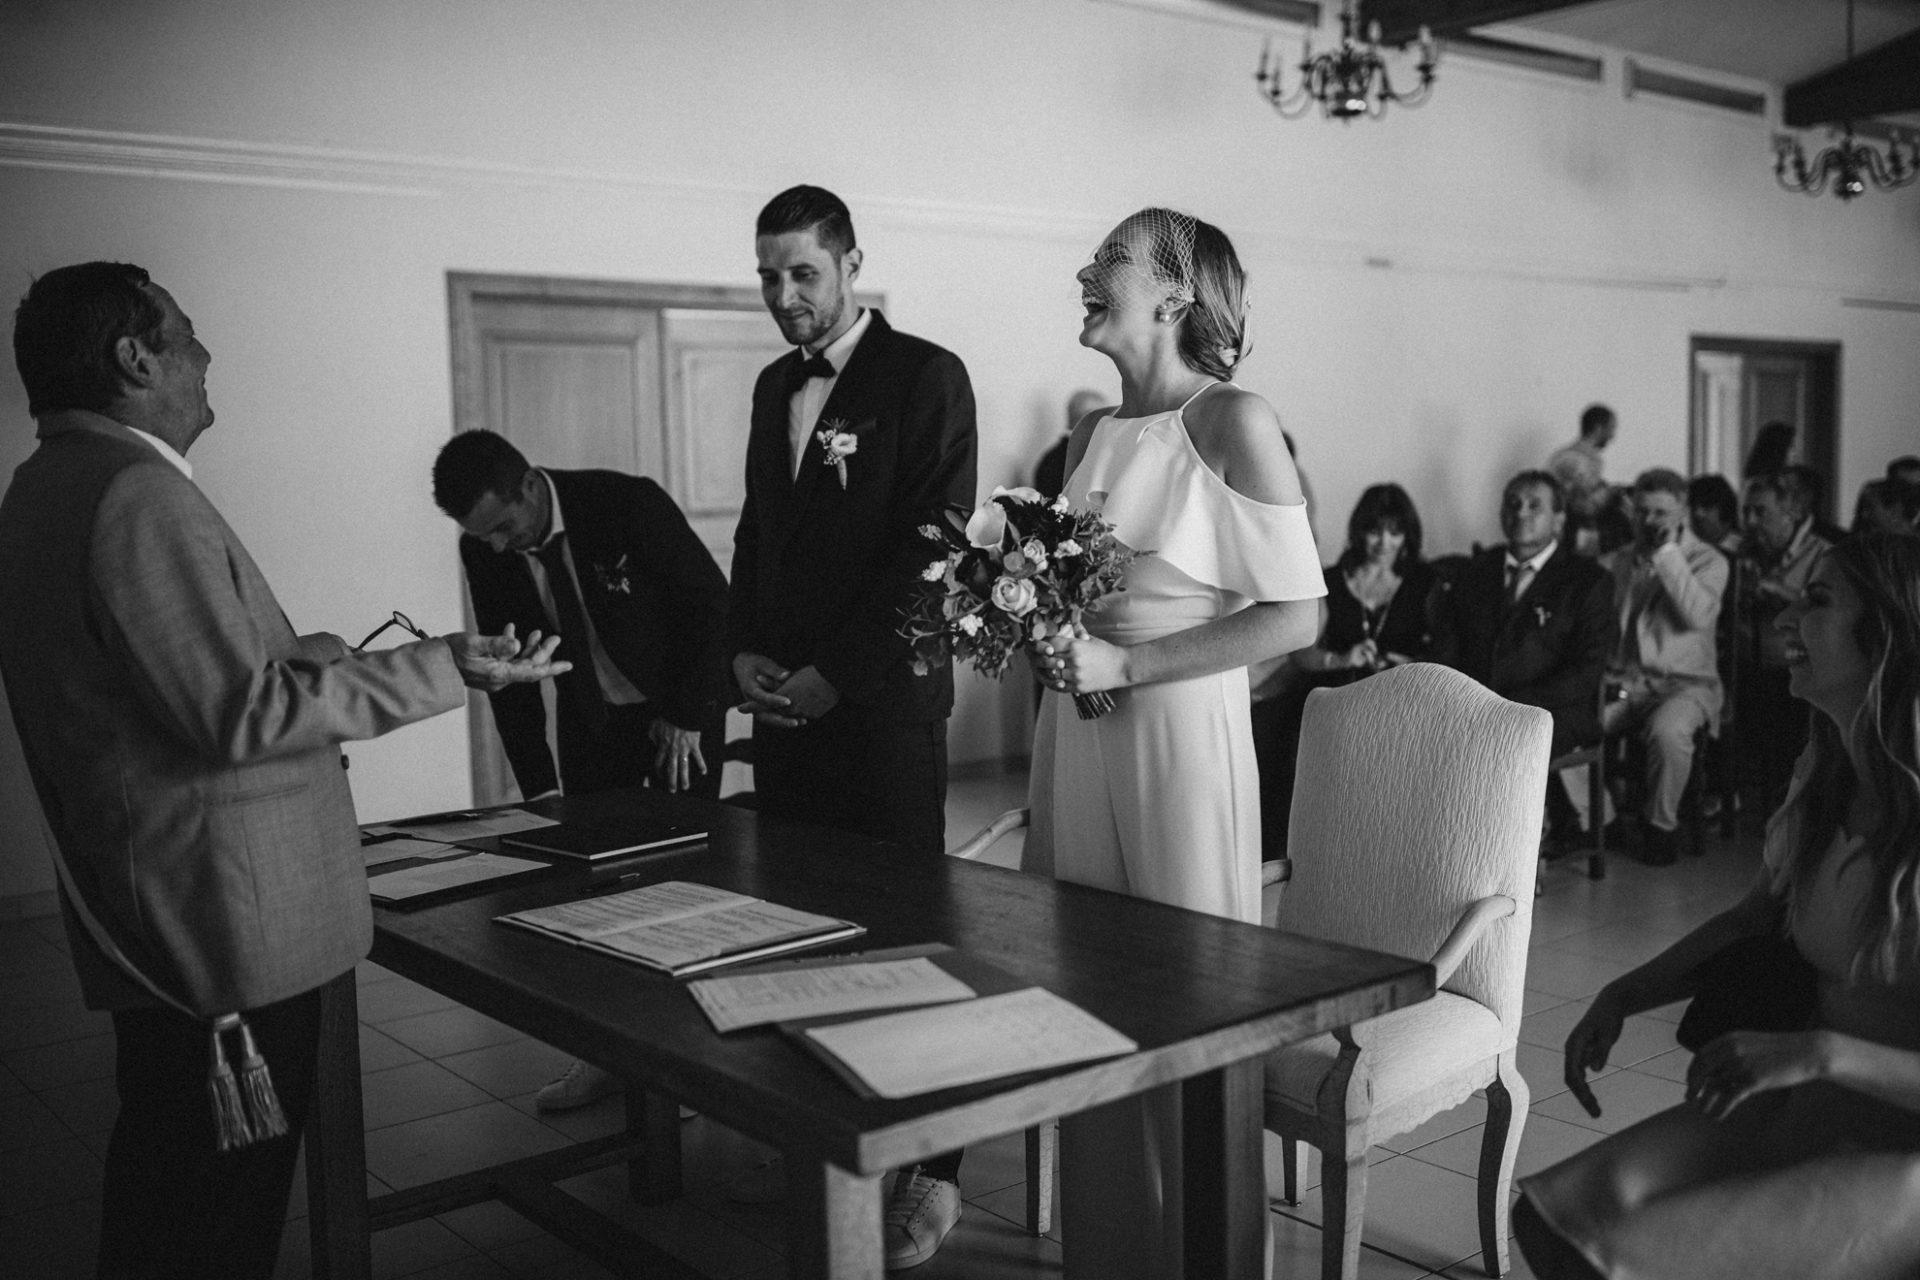 photographie de mariage naturelle spontanee mairie